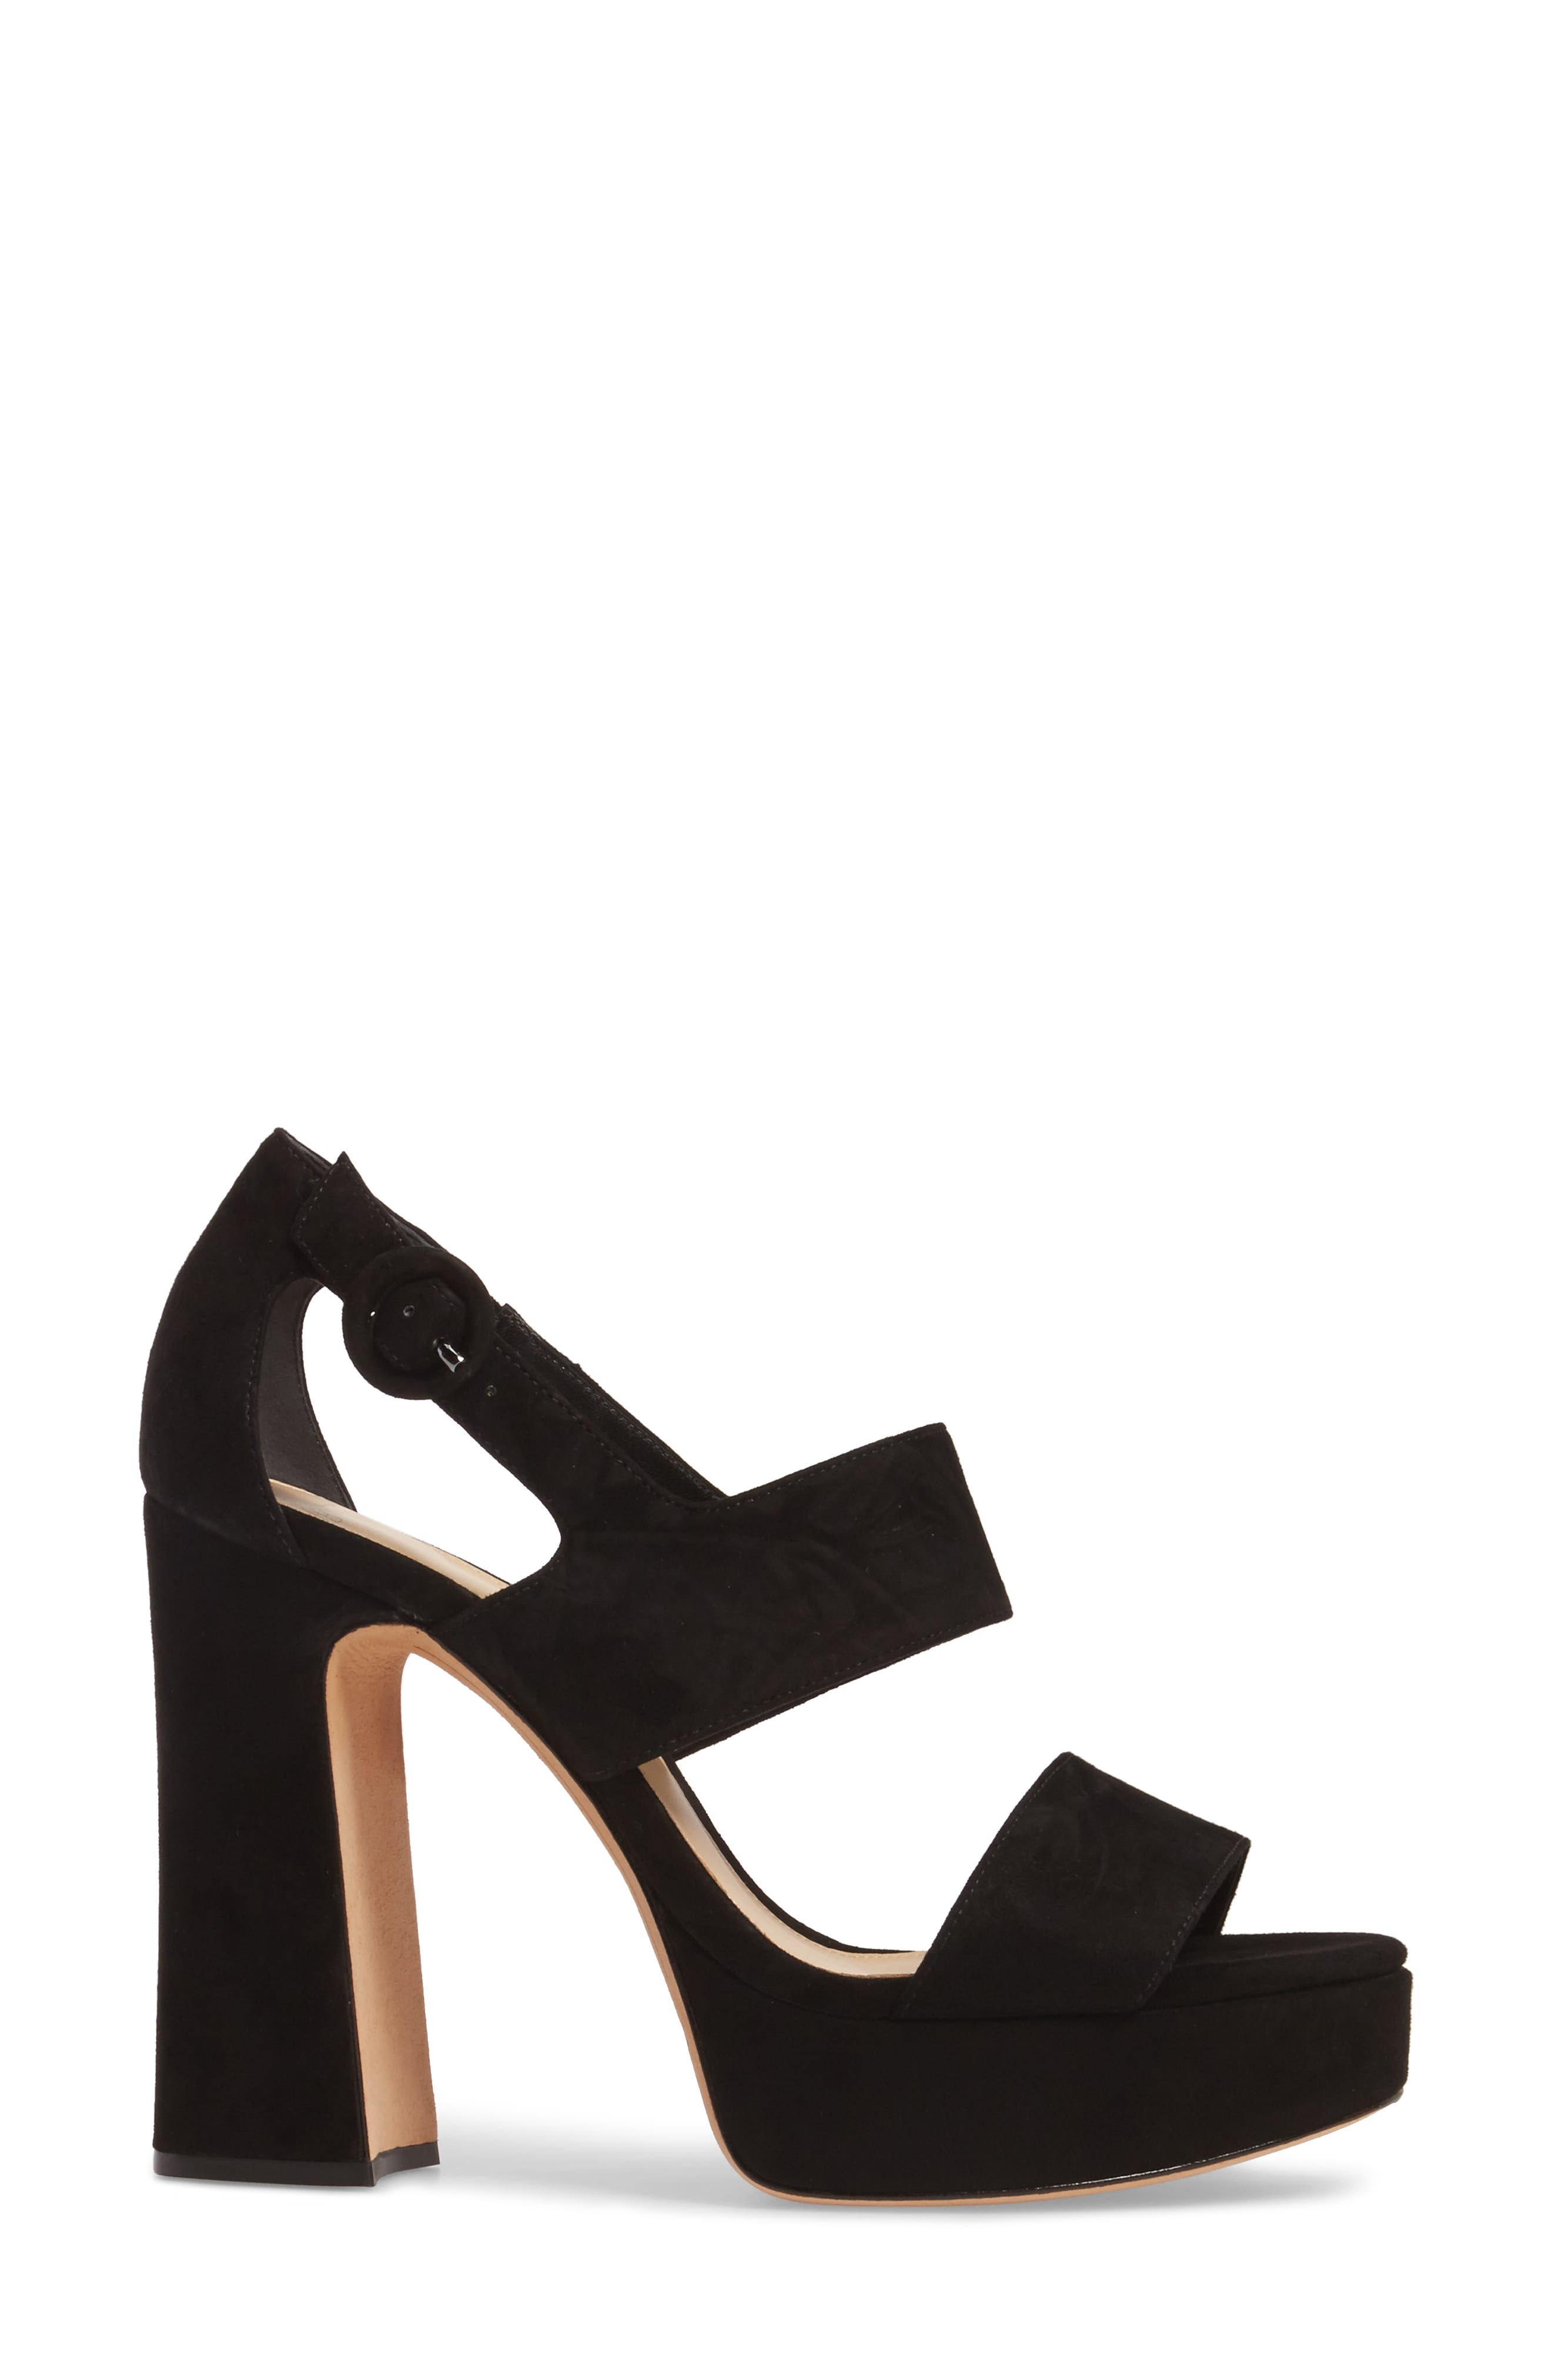 Elouise Platform Sandal,                             Alternate thumbnail 3, color,                             Black